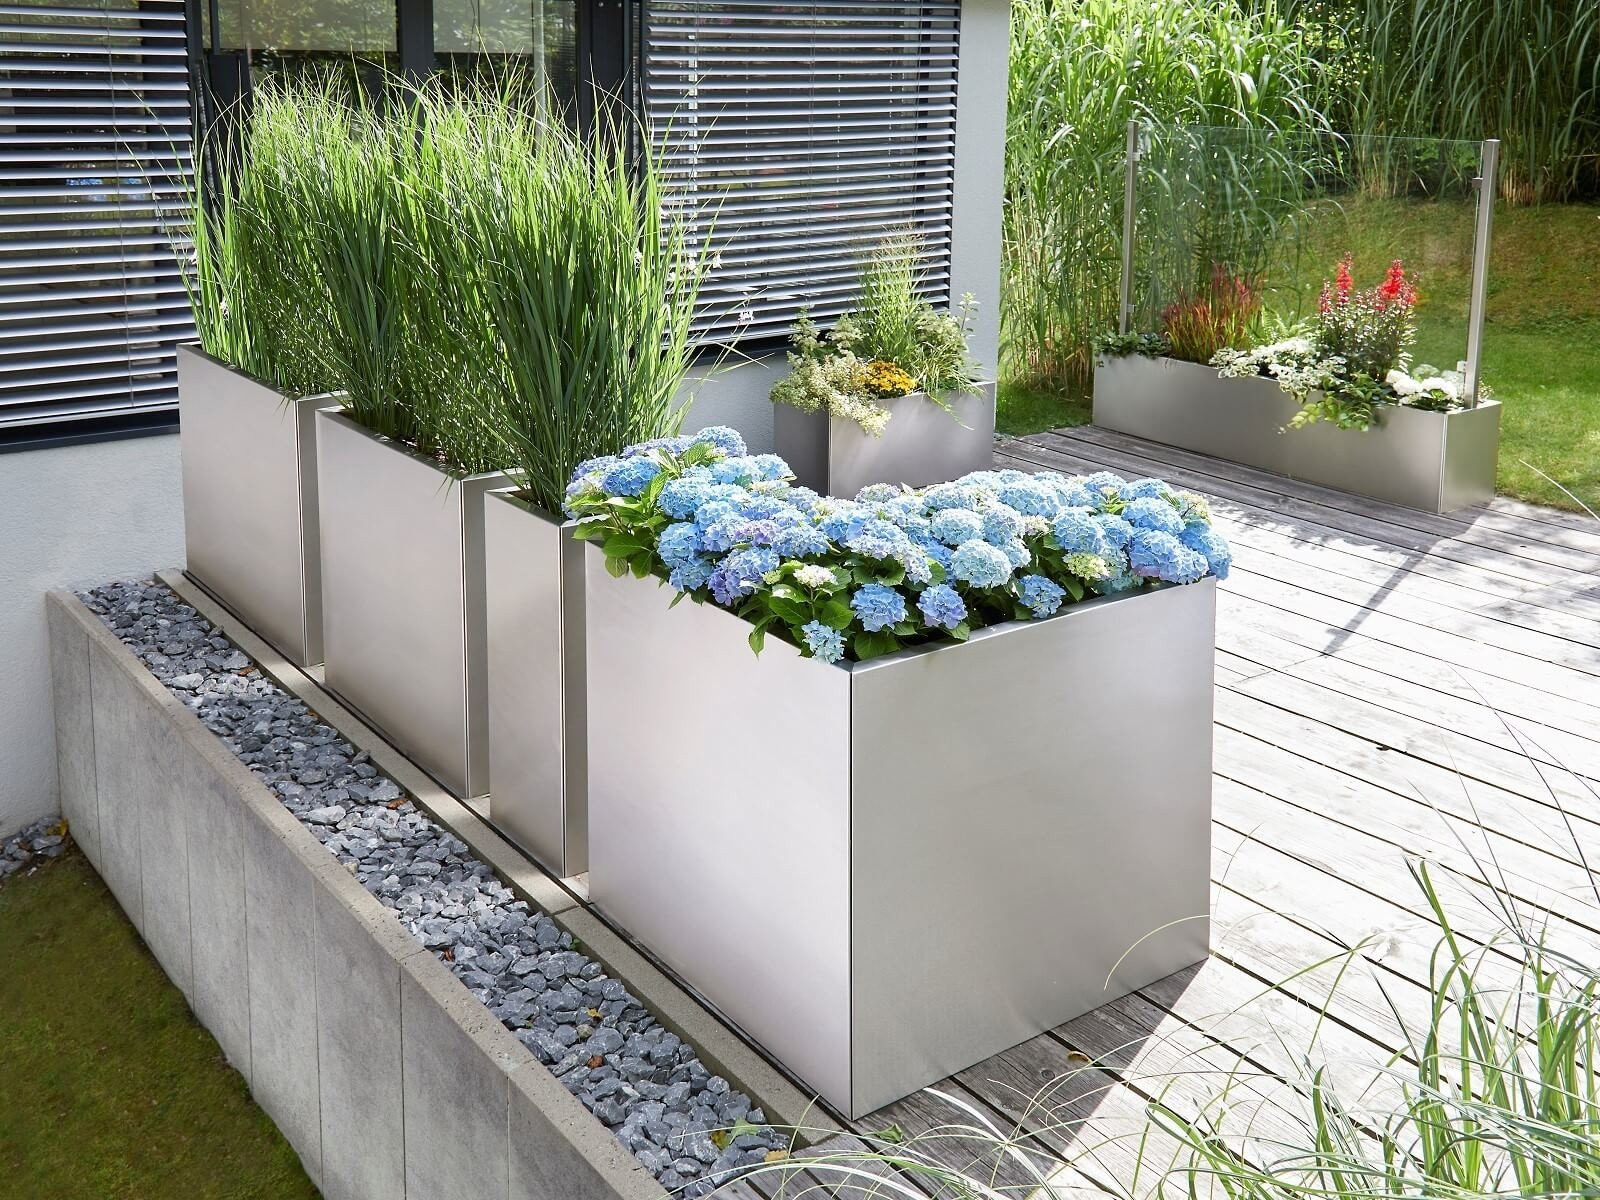 edelstahl-pflanzkübel-l-förmig-auf-der-terrasse